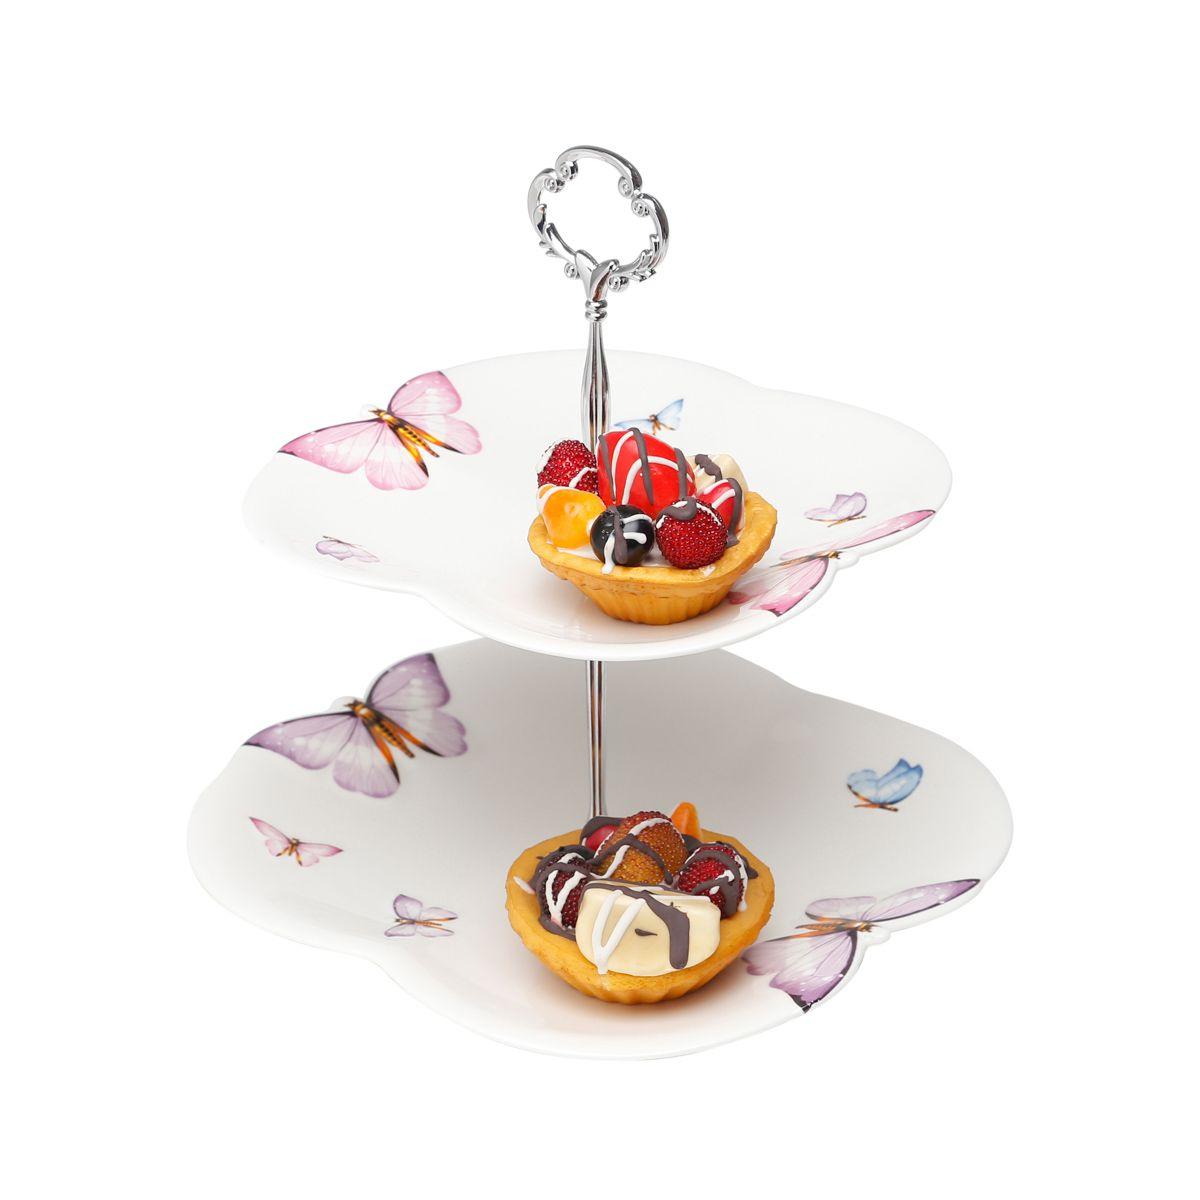 Prato duplo 25,5 cm para doces de porcelana com suporte de metal Borboletas Wolff - 25031